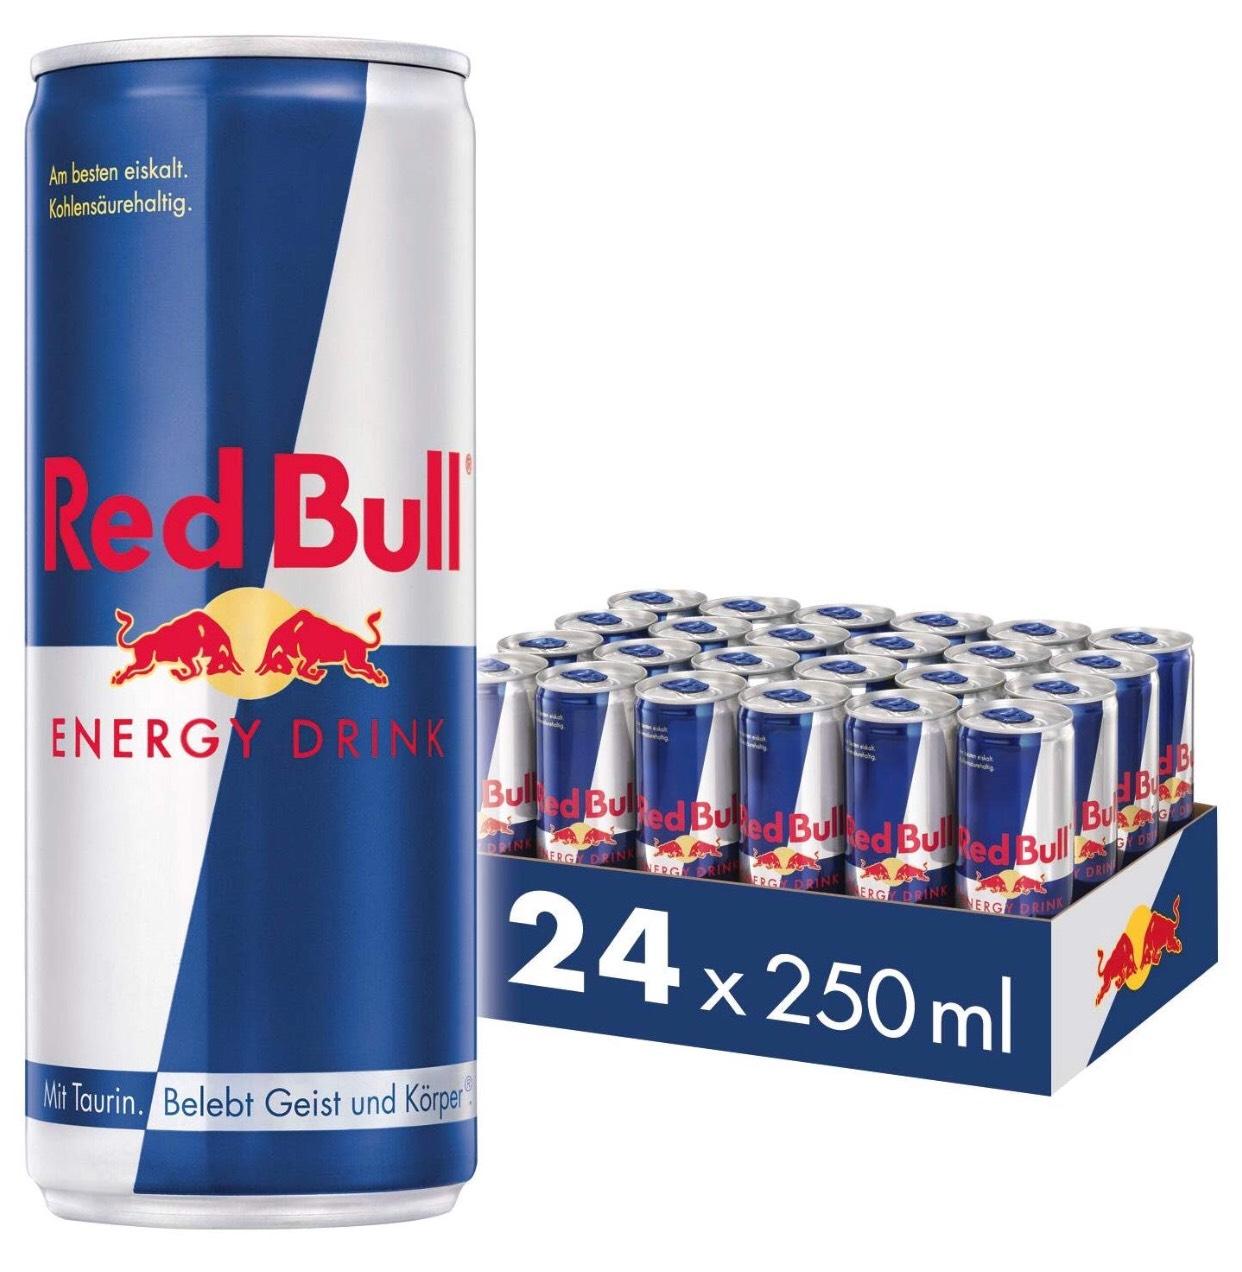 [Amazon Prime] Red Bull 24x 250ml 22,57€ Abo, sonst 23,76€ zzgl. 6€ Pfand